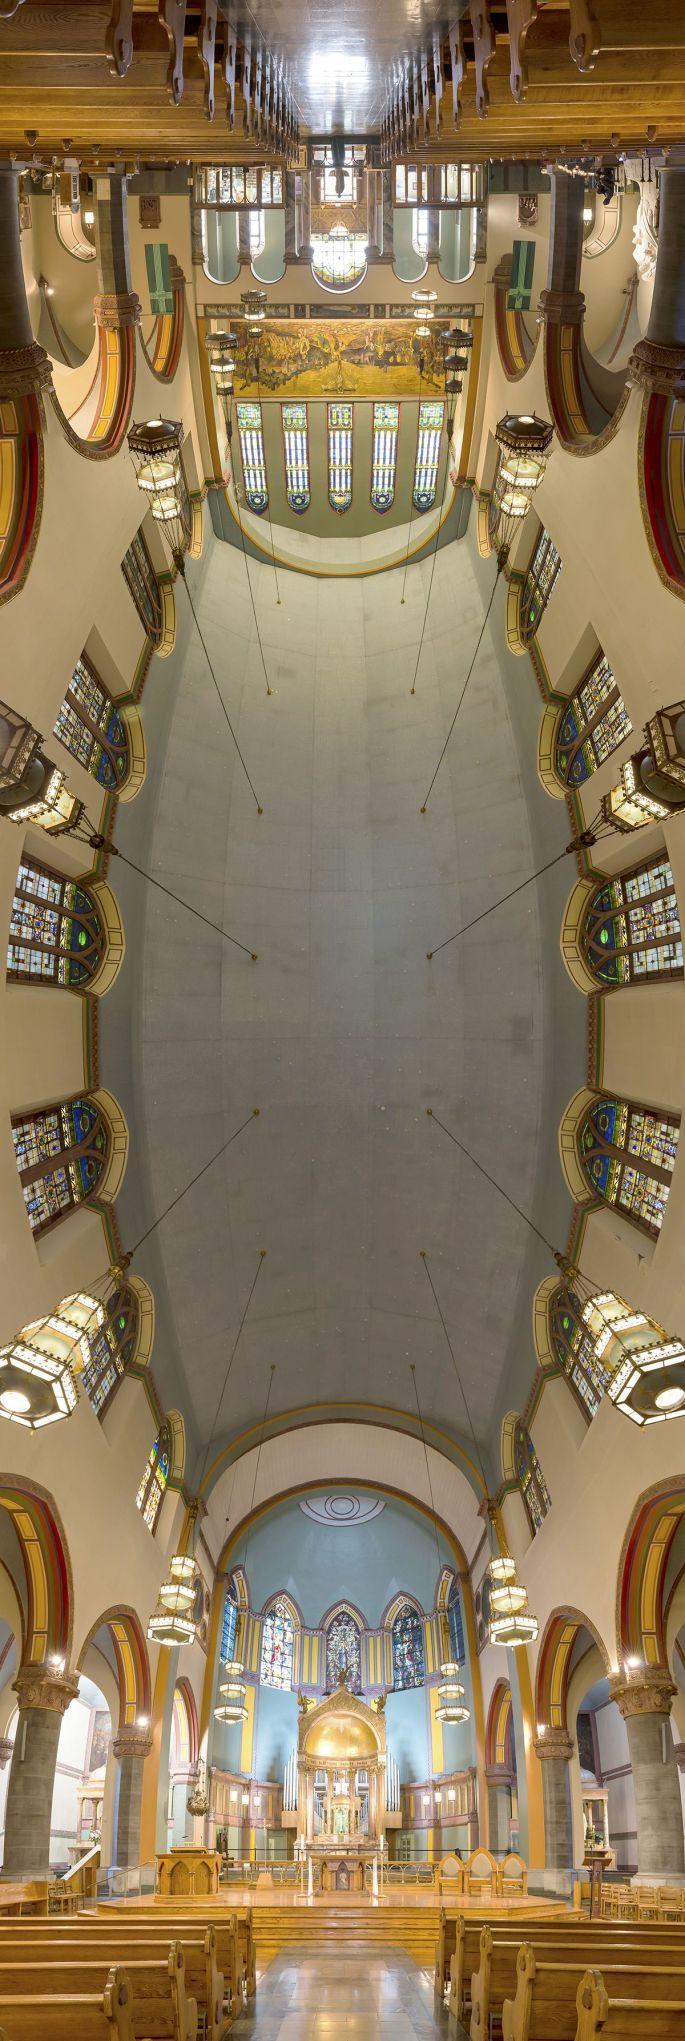 church-of-st-paul-the-apostle